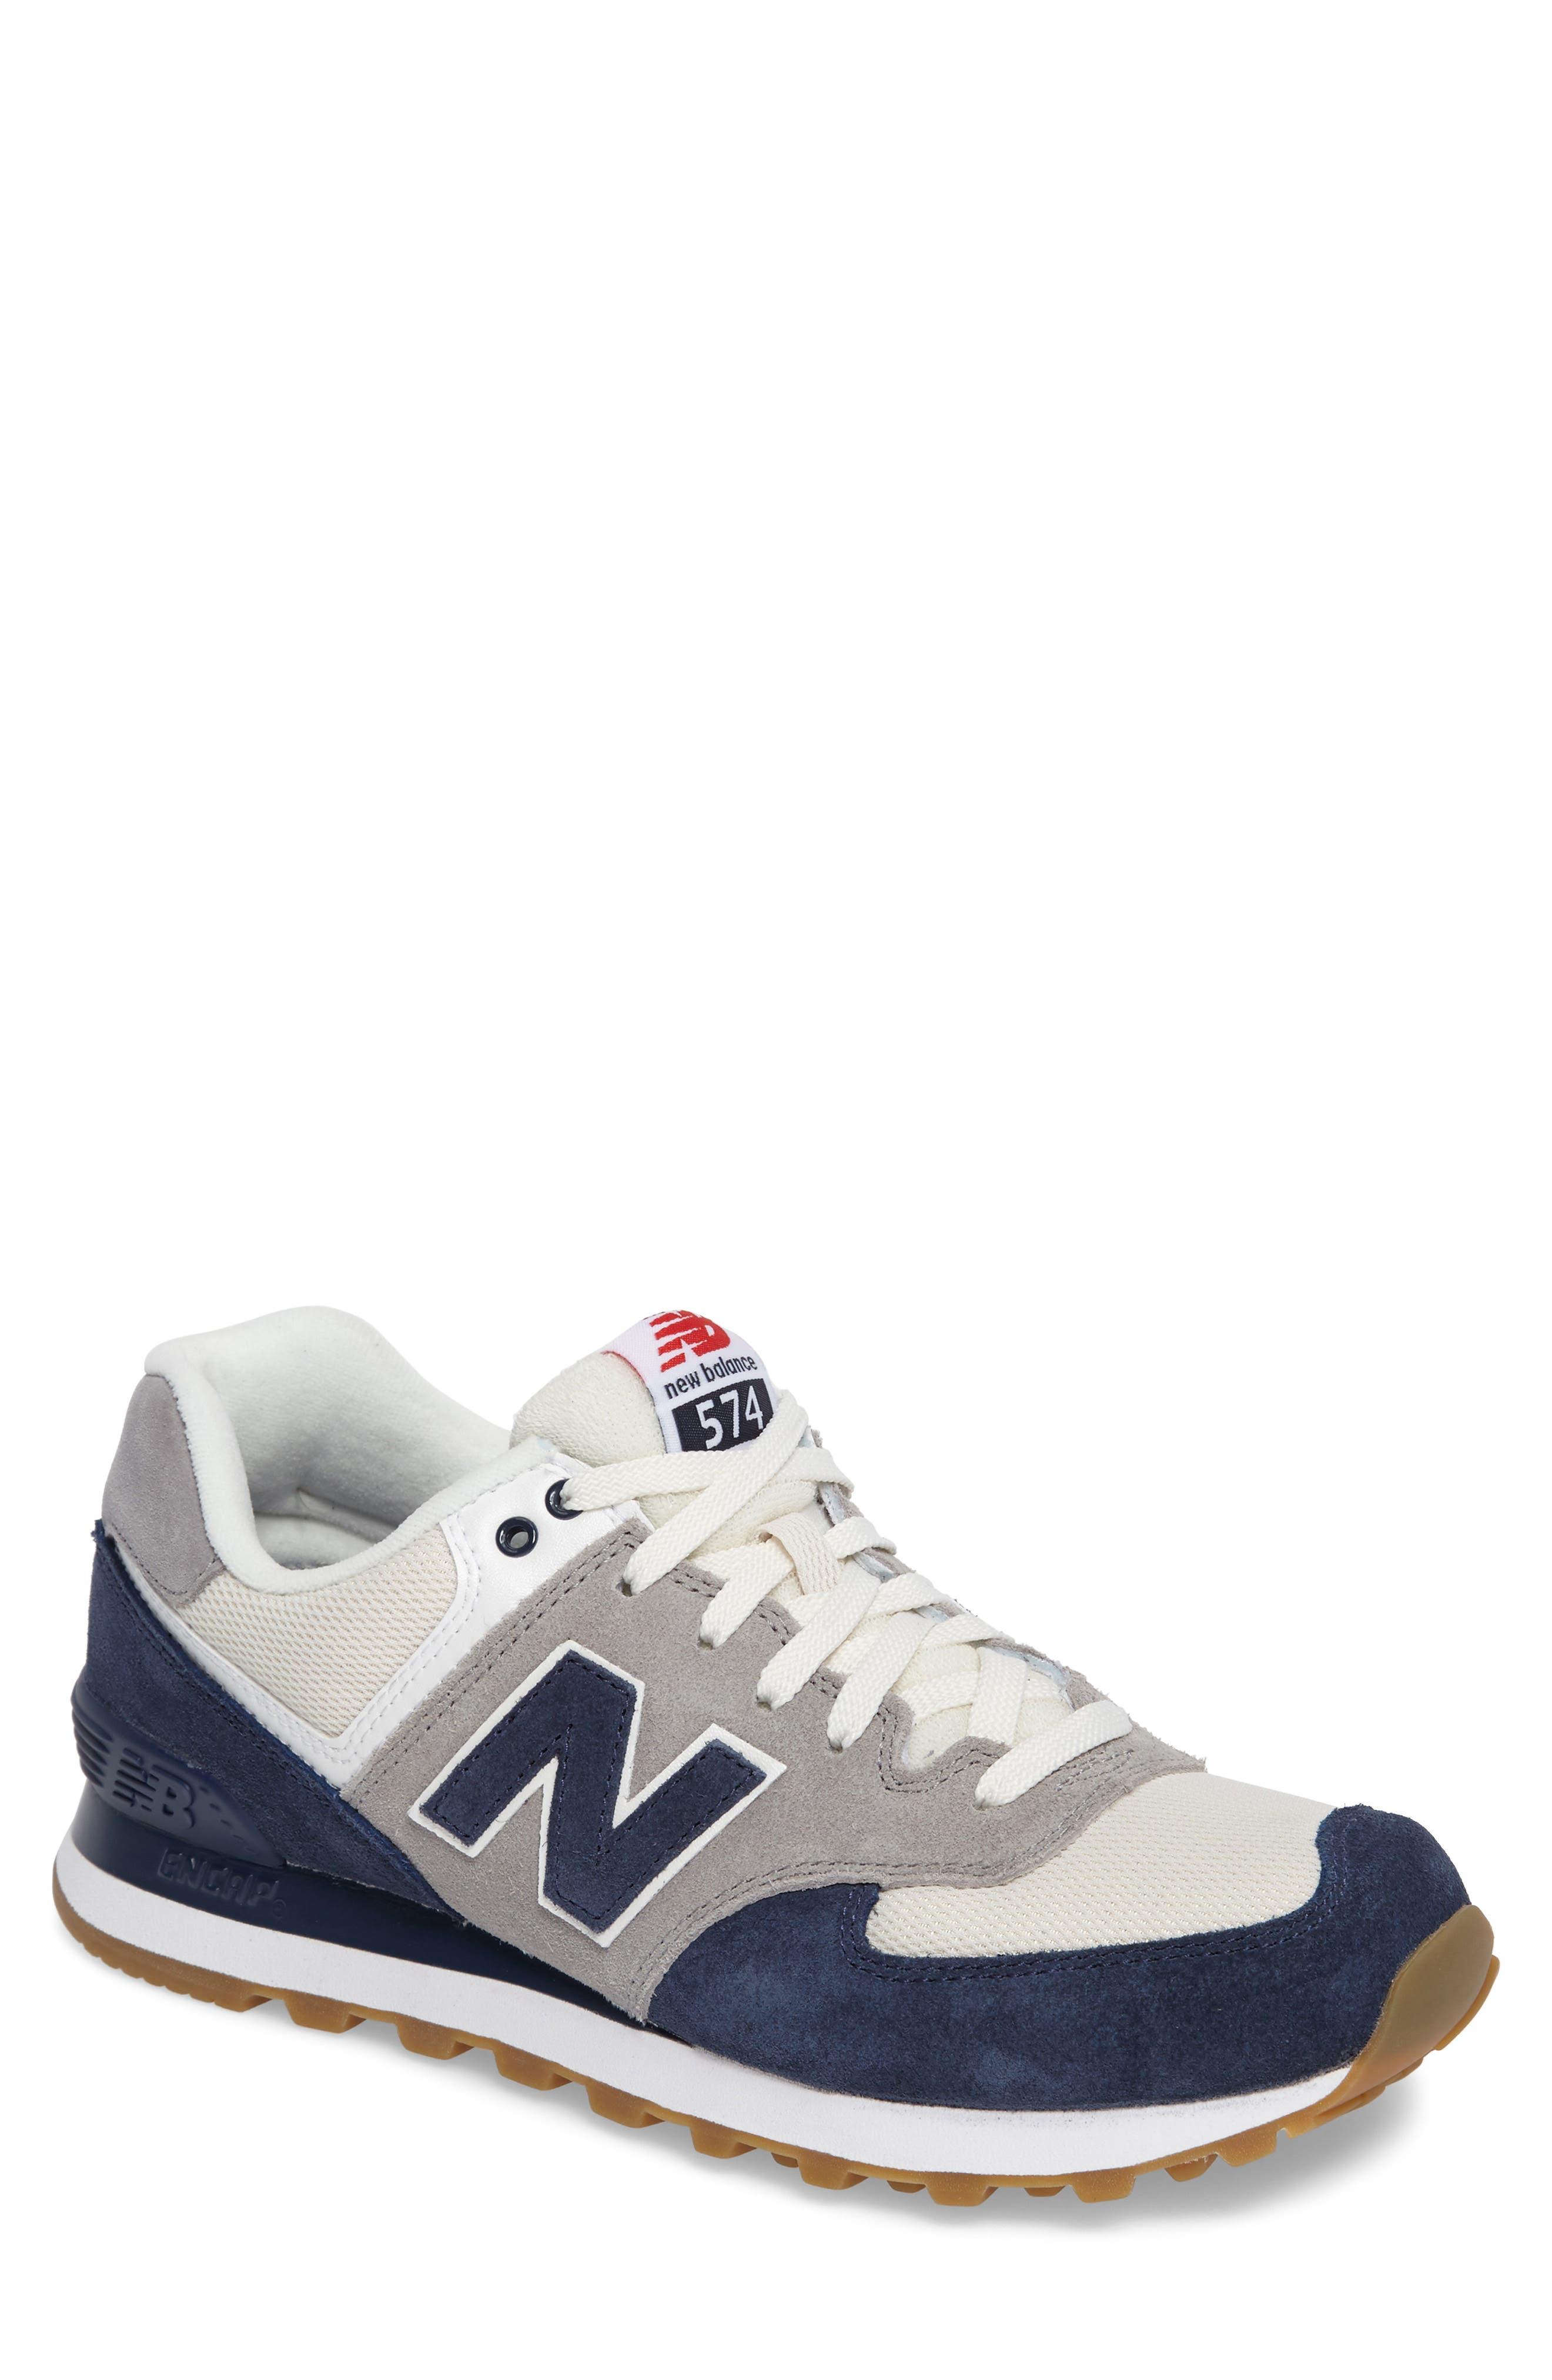 Main Image - New Balance 574 Retro Sport Sneaker (Men)